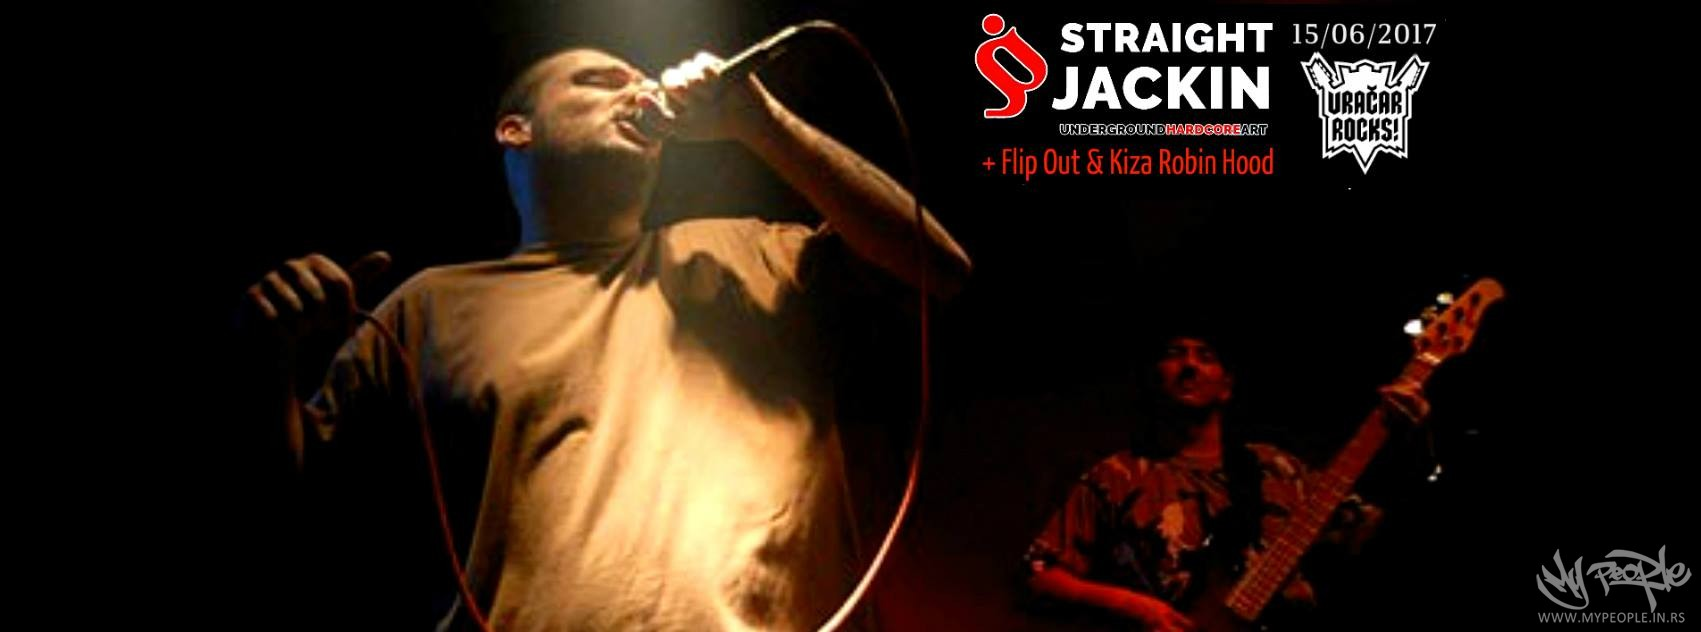 Straight Jackin +Flip Out & Voke @ Božidarac